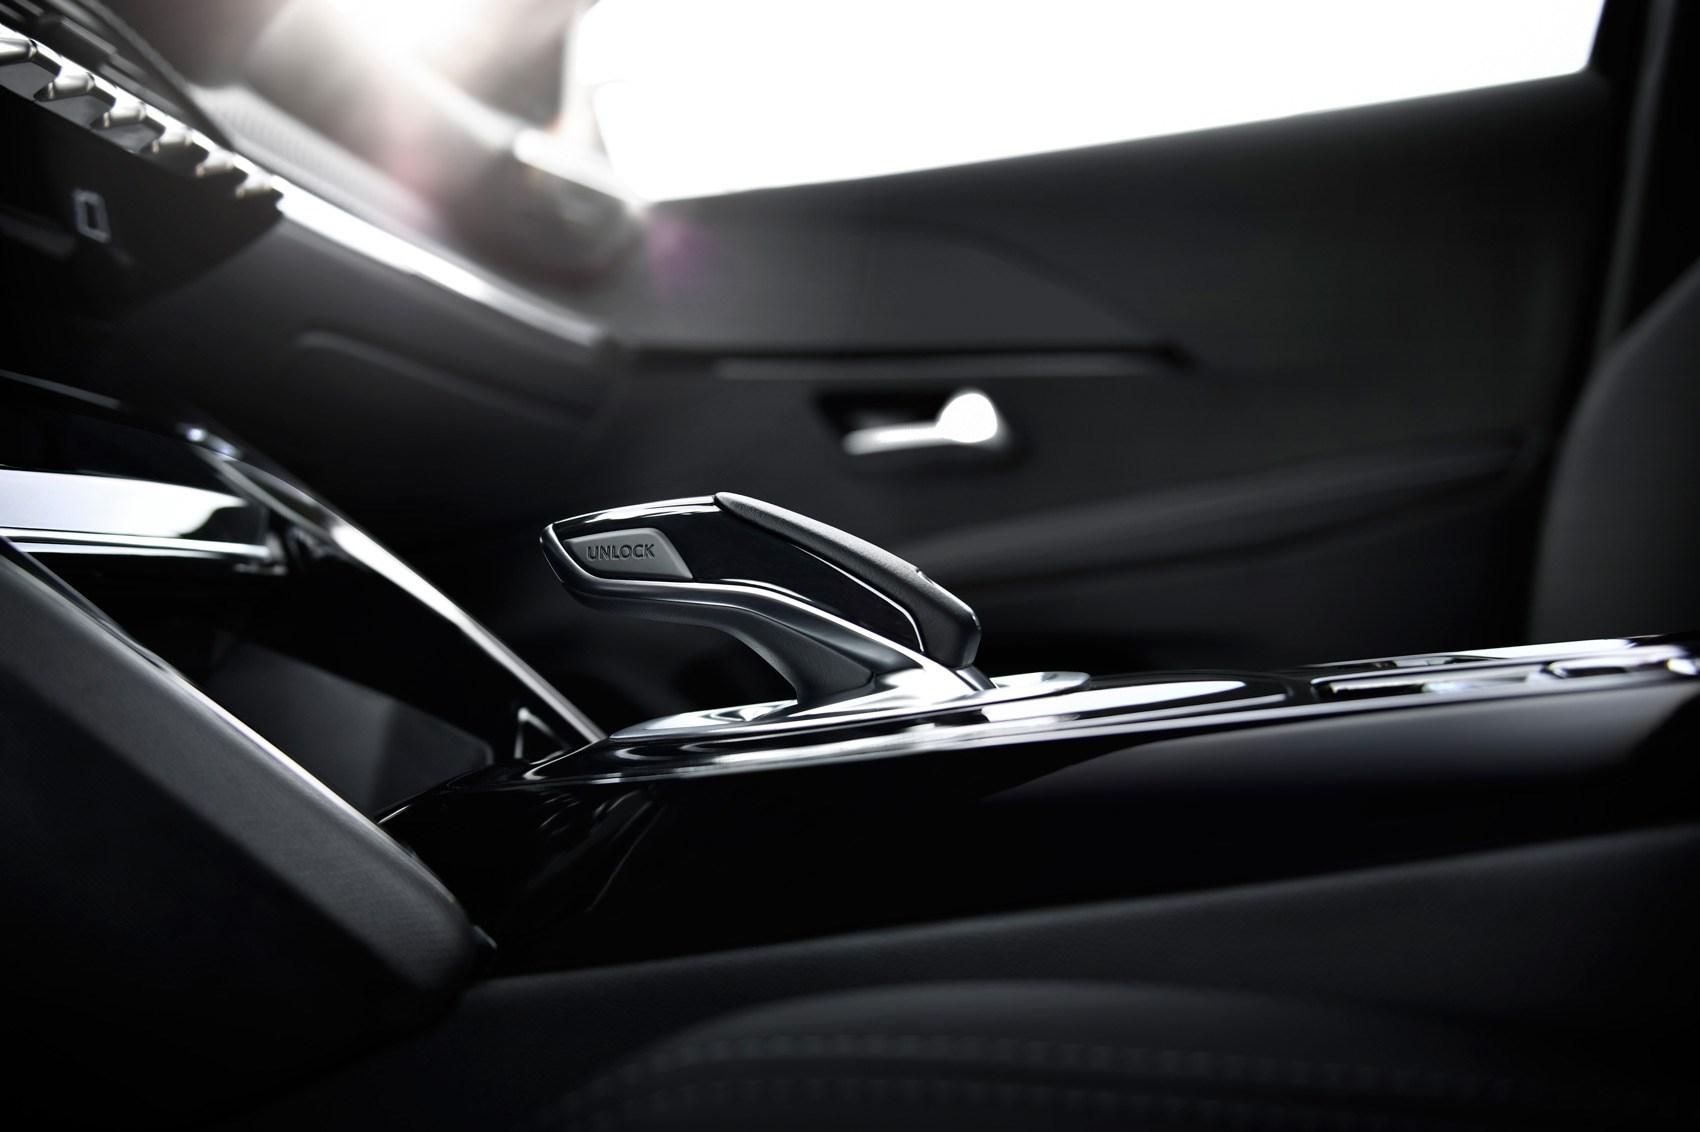 New 2019 Peugeot 208 and e-208: the full story | CAR Magazine